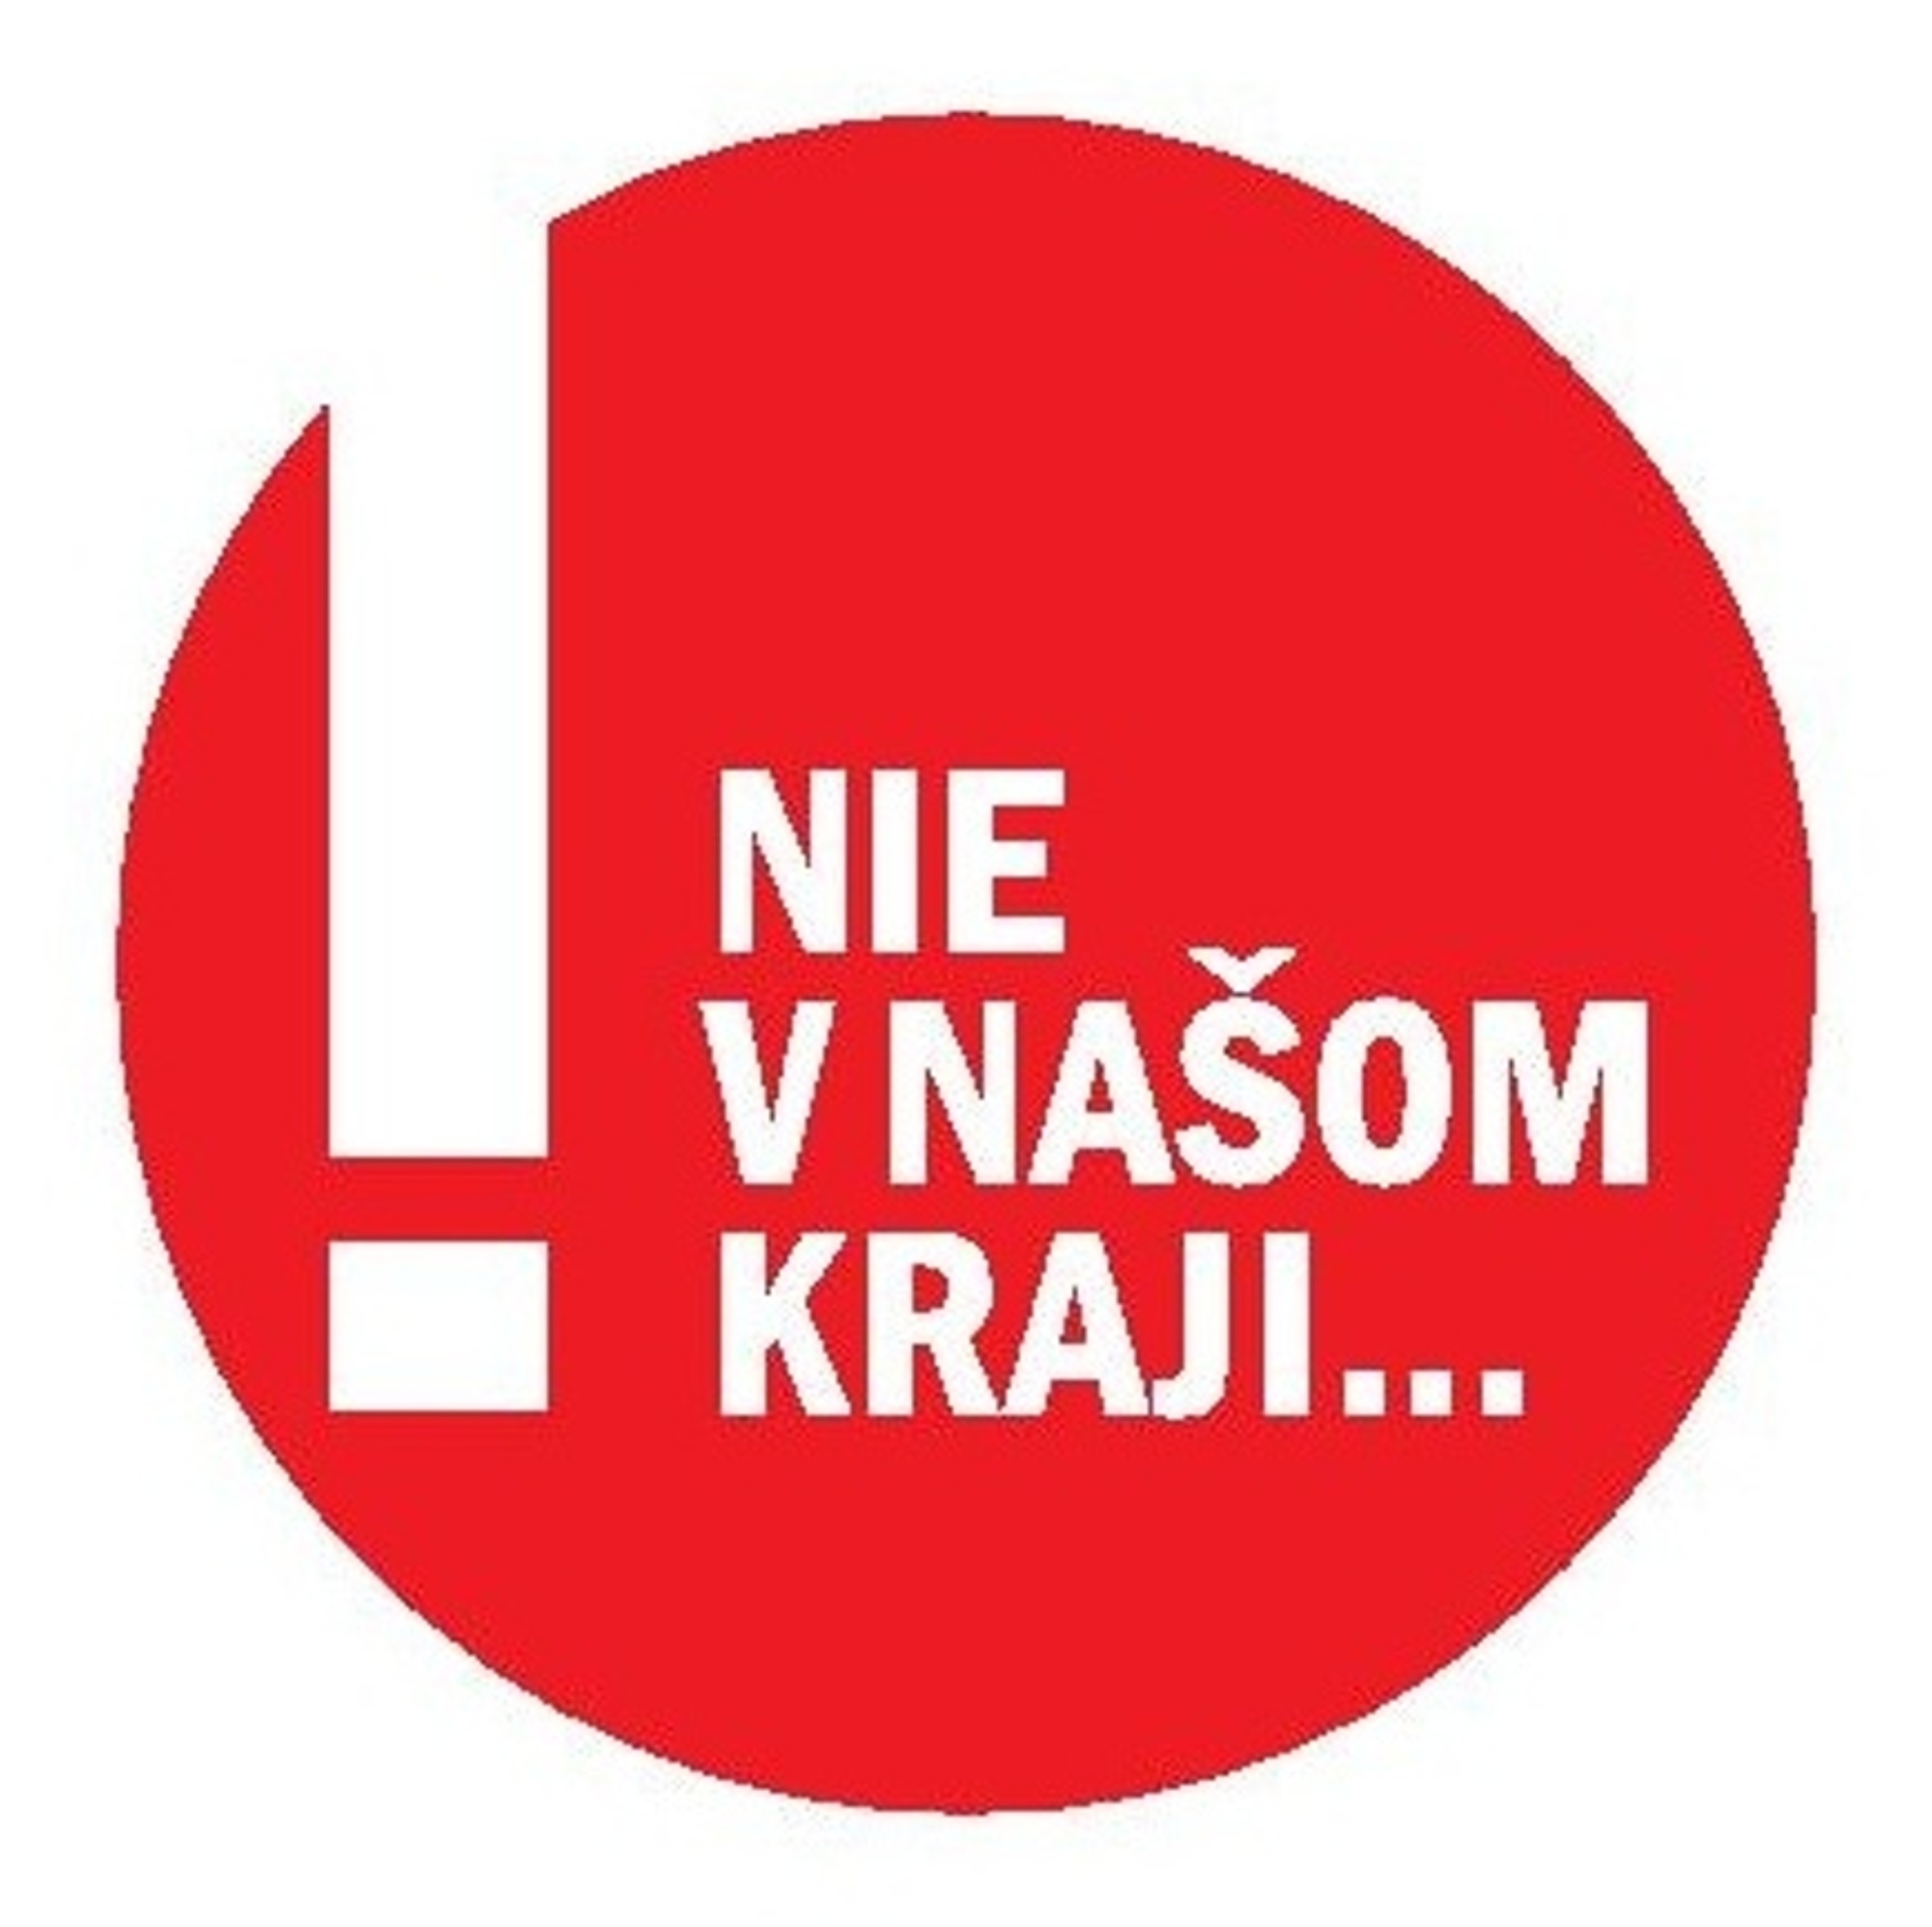 nie_v_nasom-kraji logo